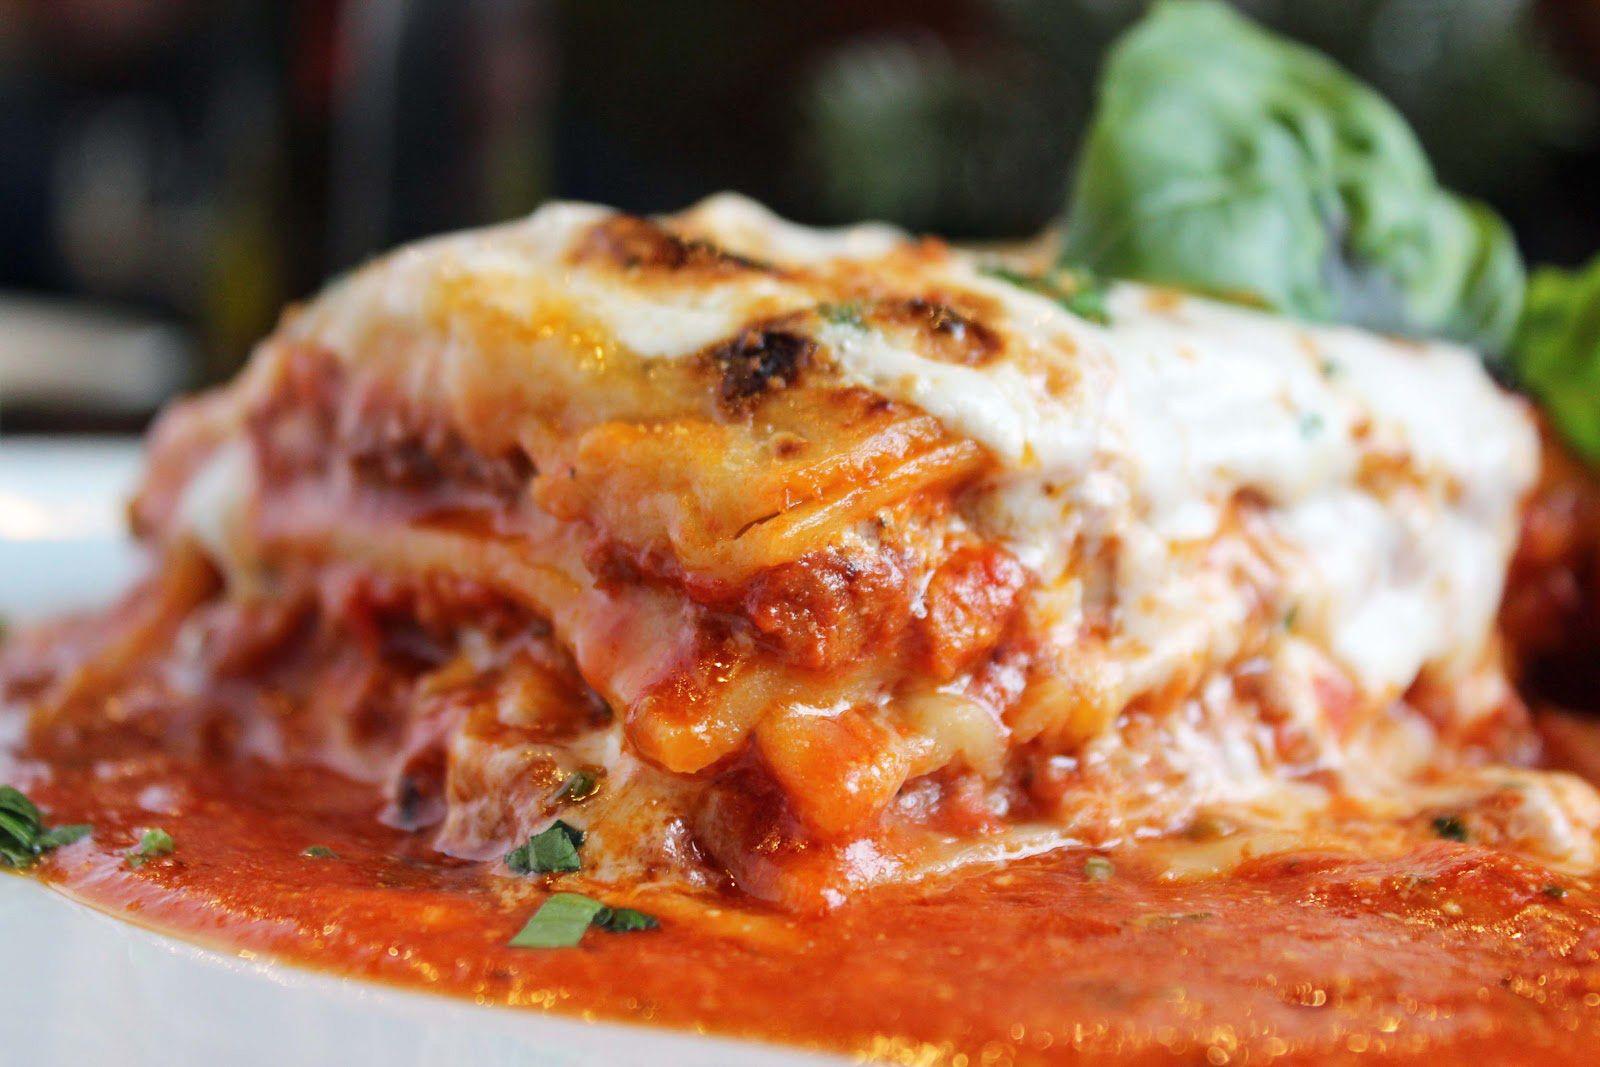 10affff6cabaf31eed4367feab71ceb0 - Ricette Lasagna